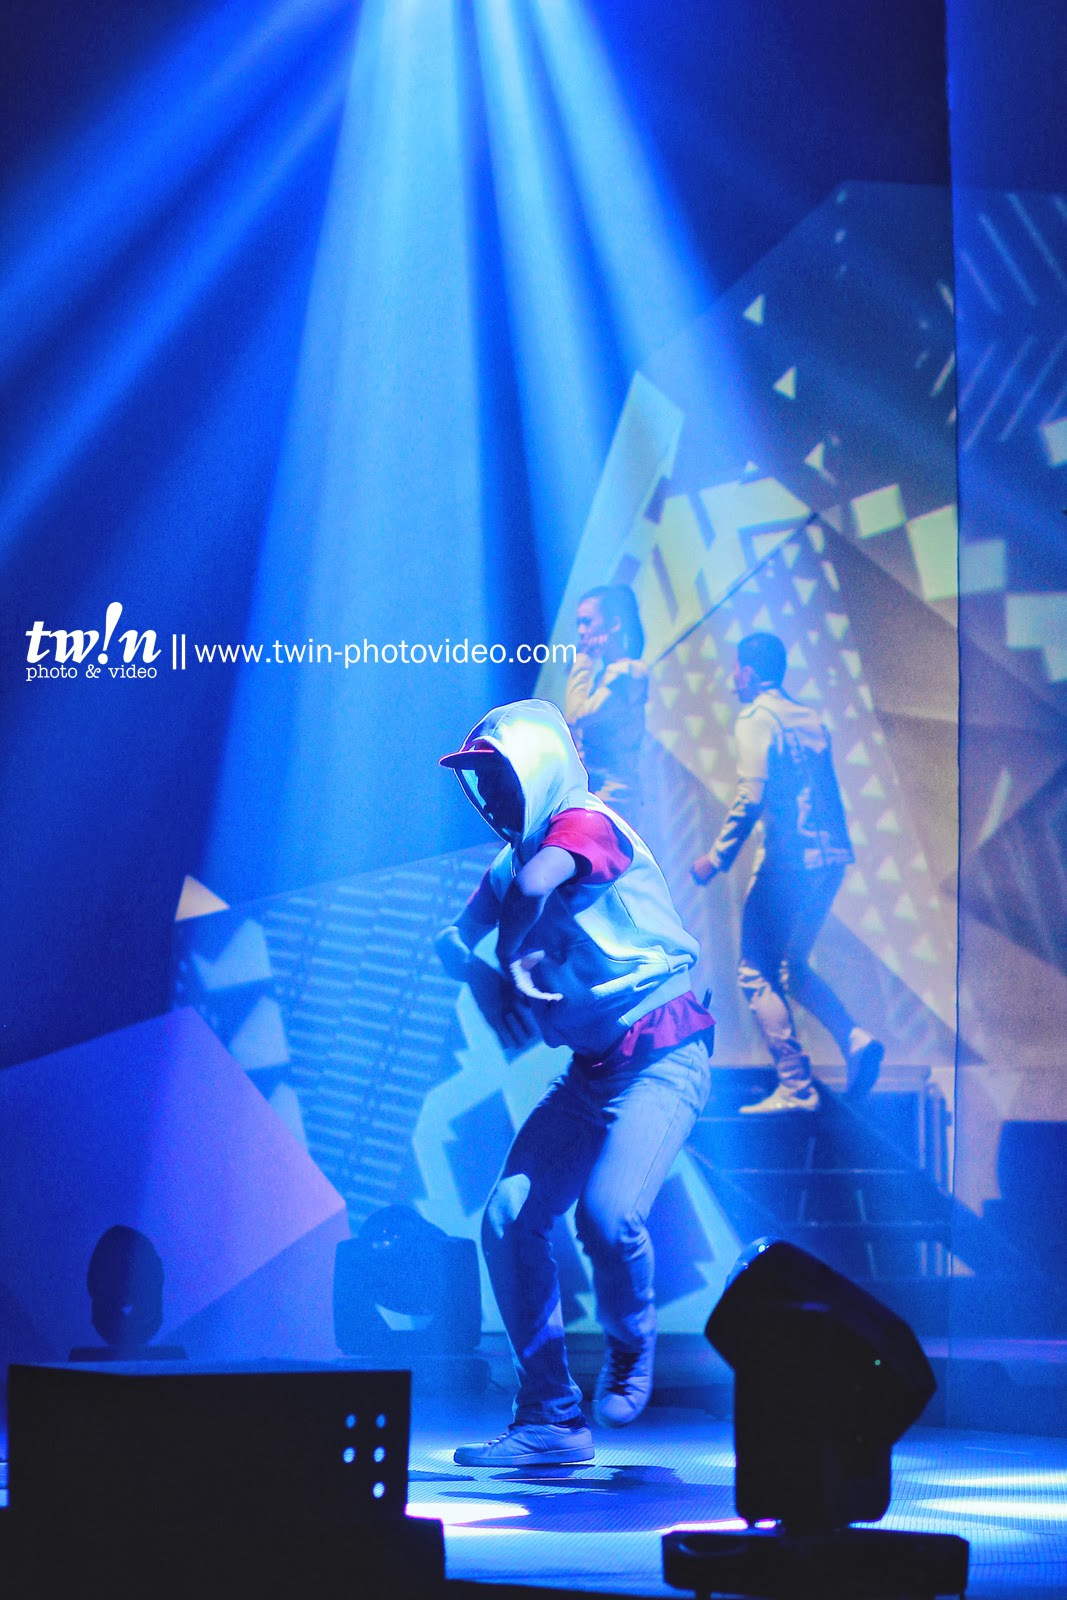 Dance In Action at 3030SERANG